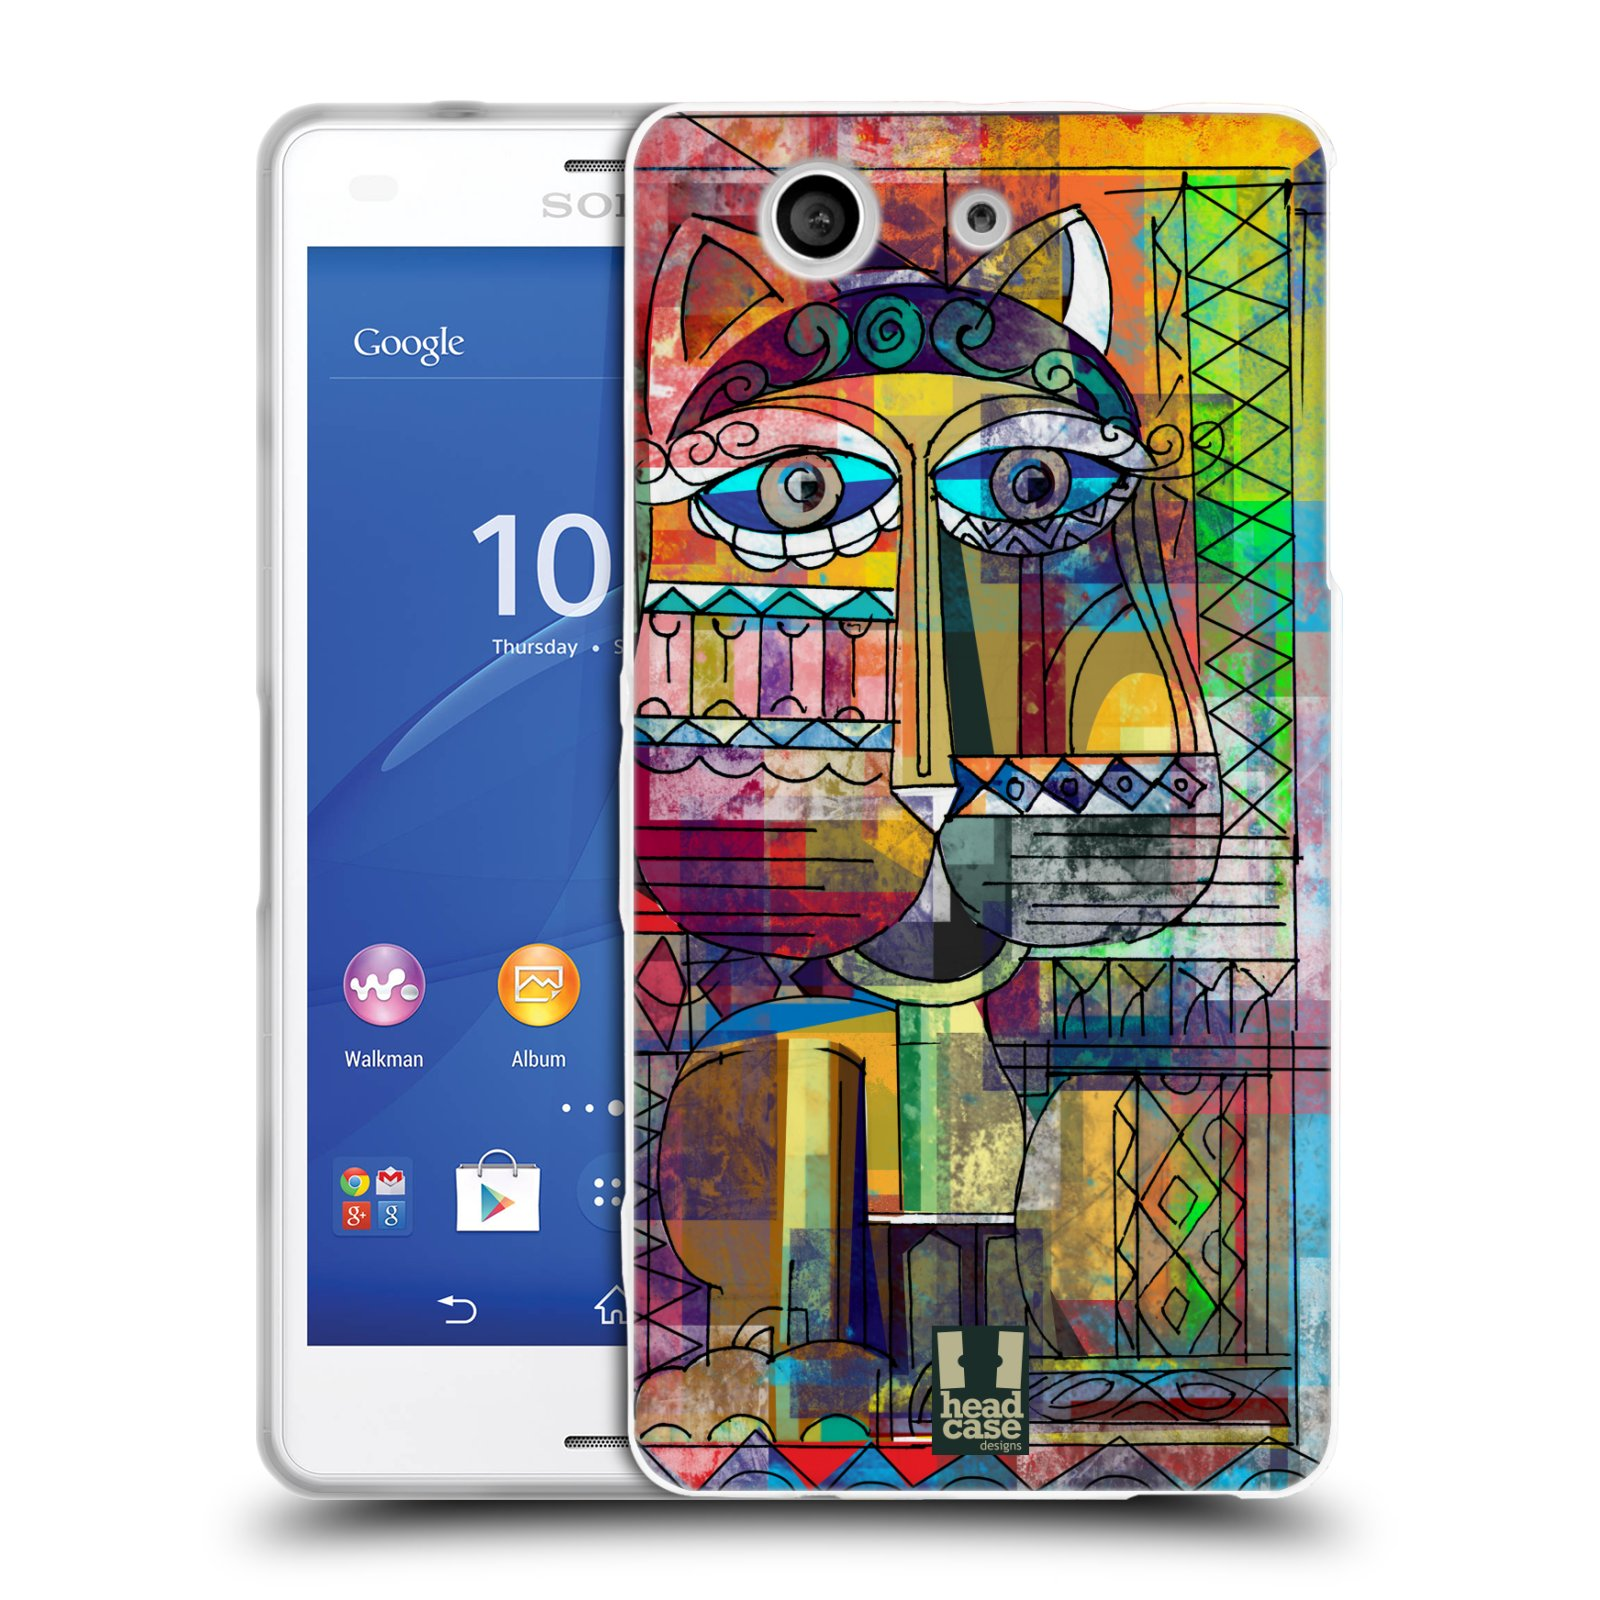 Silikonové pouzdro na mobil Sony Xperia Z3 Compact D5803 HEAD CASE AZTEC KORAT